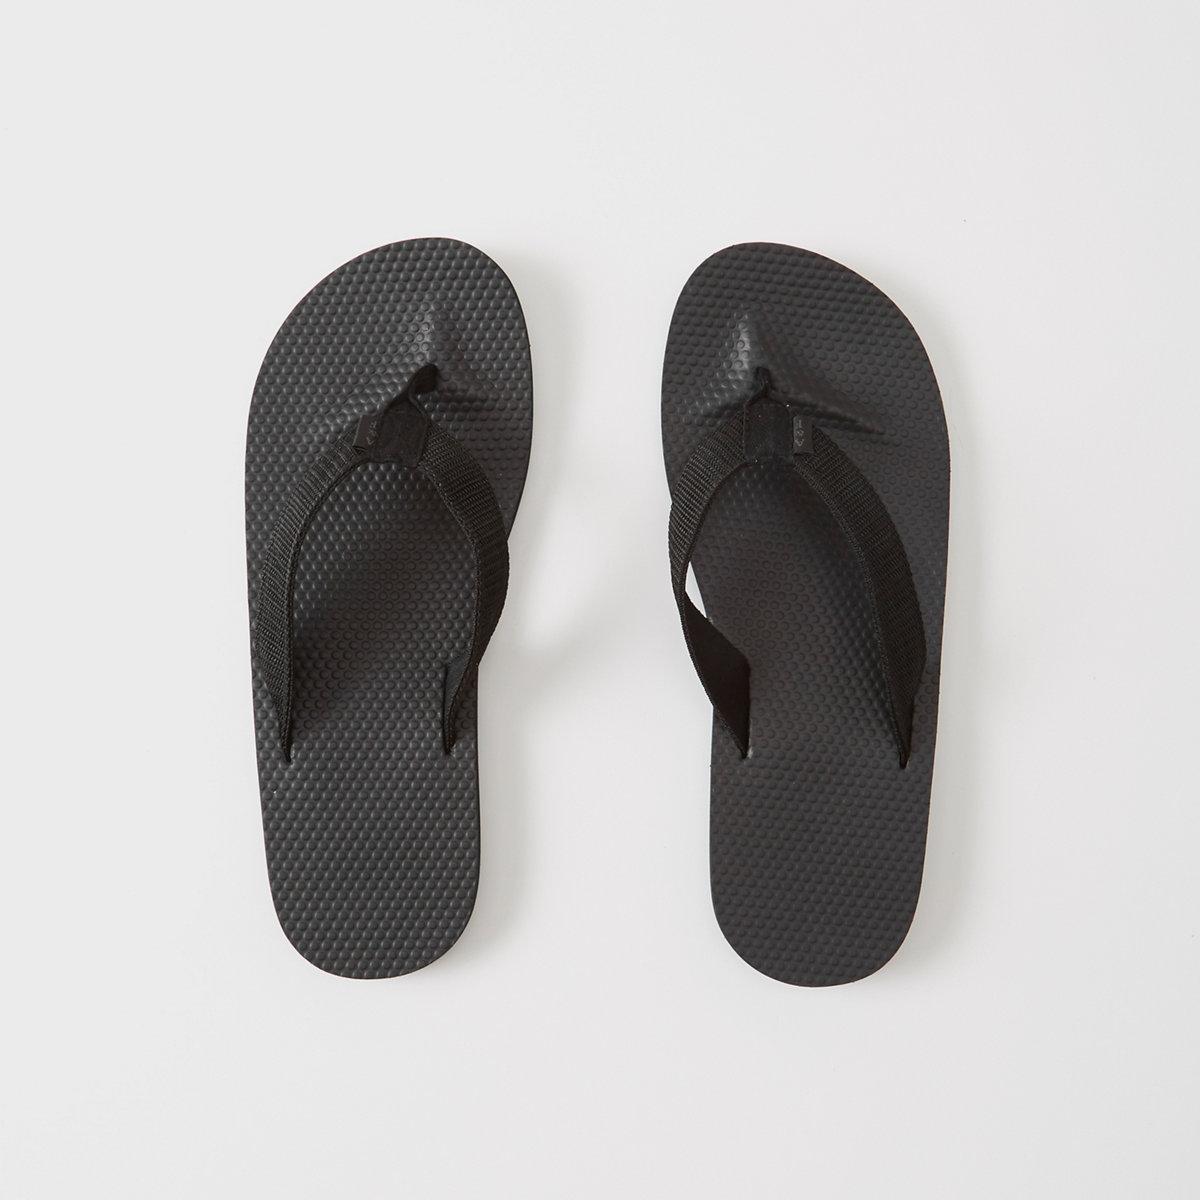 Mixed Media Rubber Flip Flops